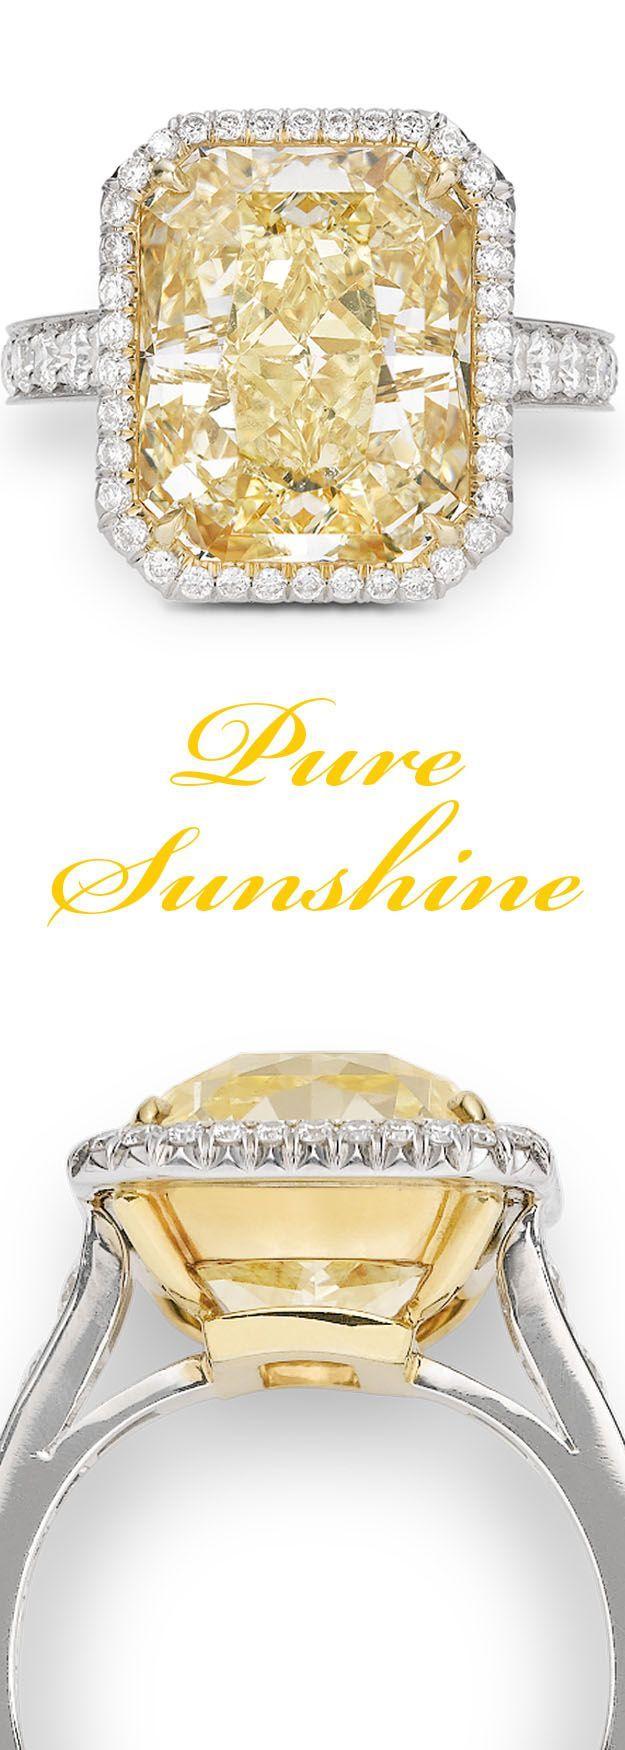 This awe inspiring 1021 carat yellow diamond bears the natural this awe inspiring 1021 carat yellow diamond bears the natural fancy color grade ms nvjuhfo Choice Image